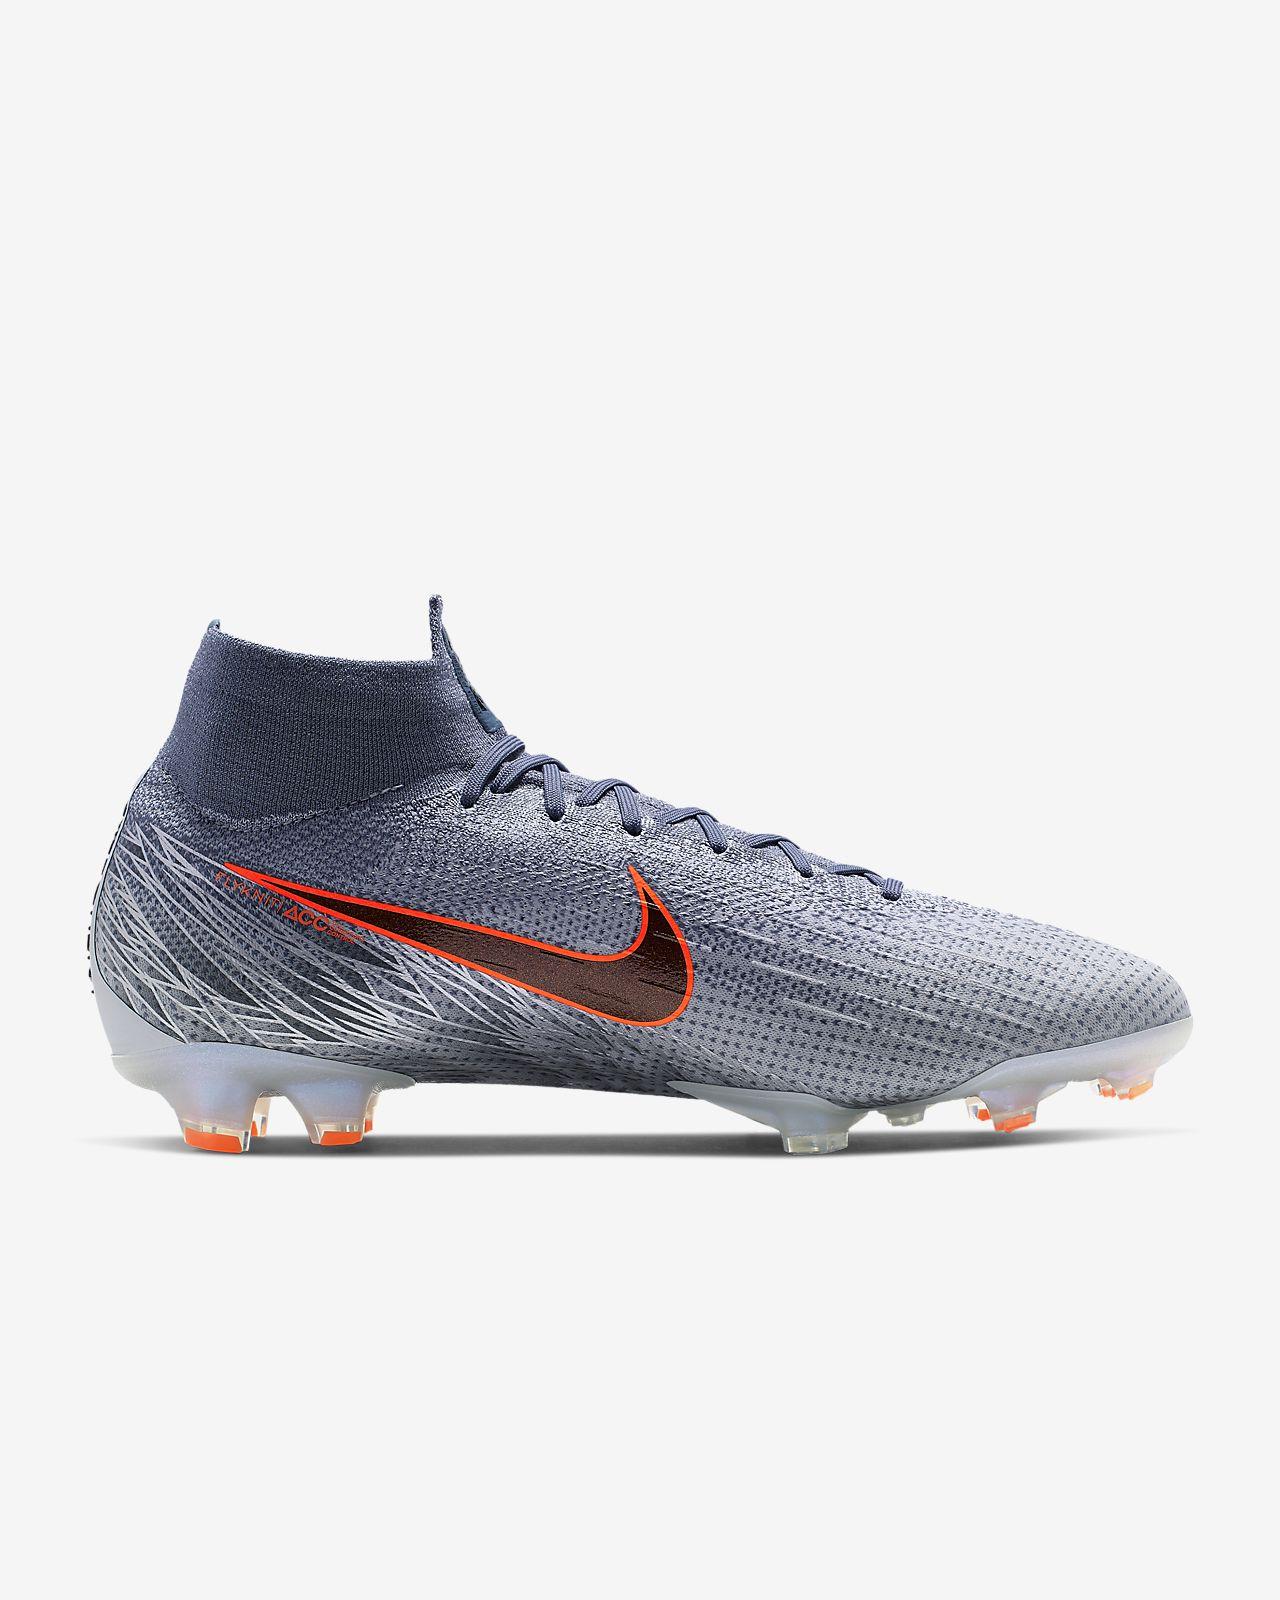 0c79dd3b42fb Nike Superfly 6 Elite FG Firm-Ground Football Boot. Nike.com AU